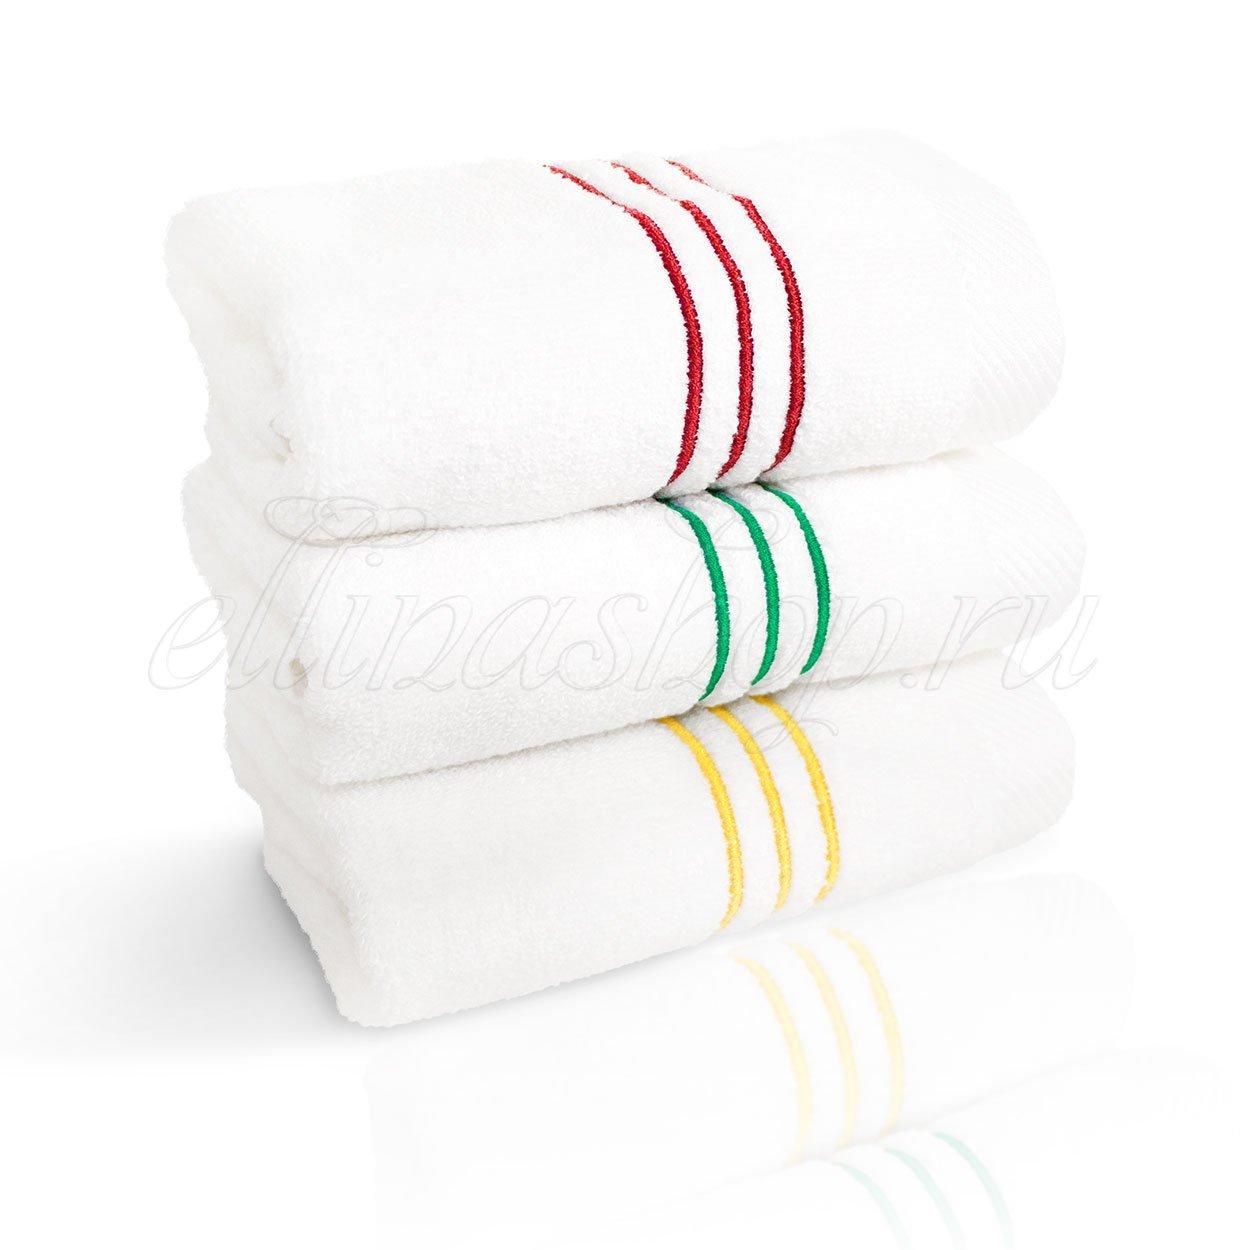 Stripe - комплект полотенец 3шт. Softcotton